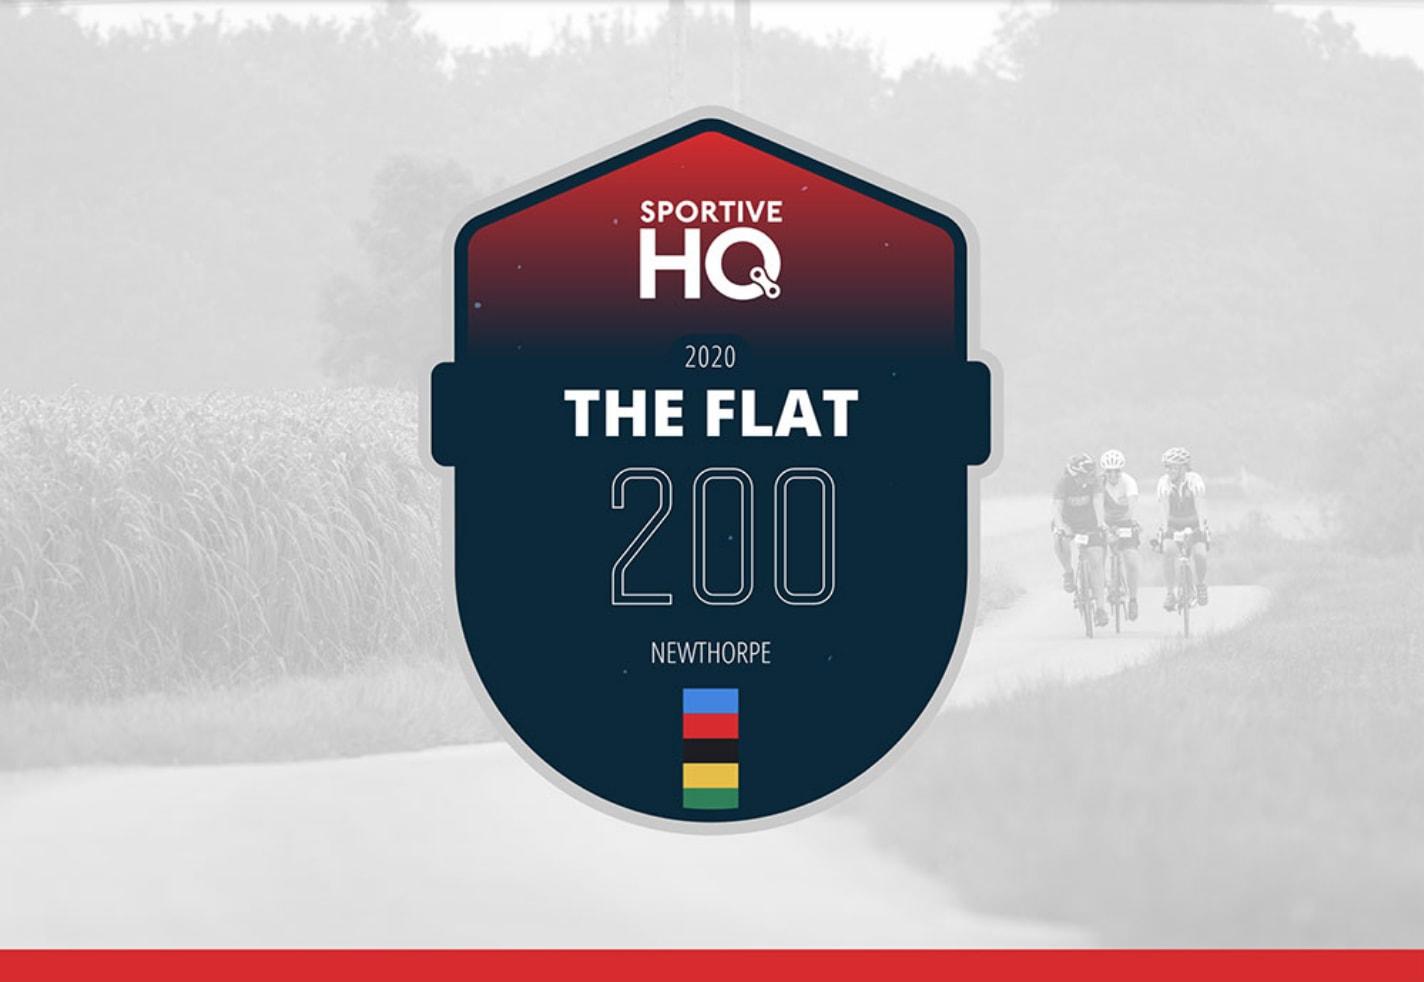 The Flat 200